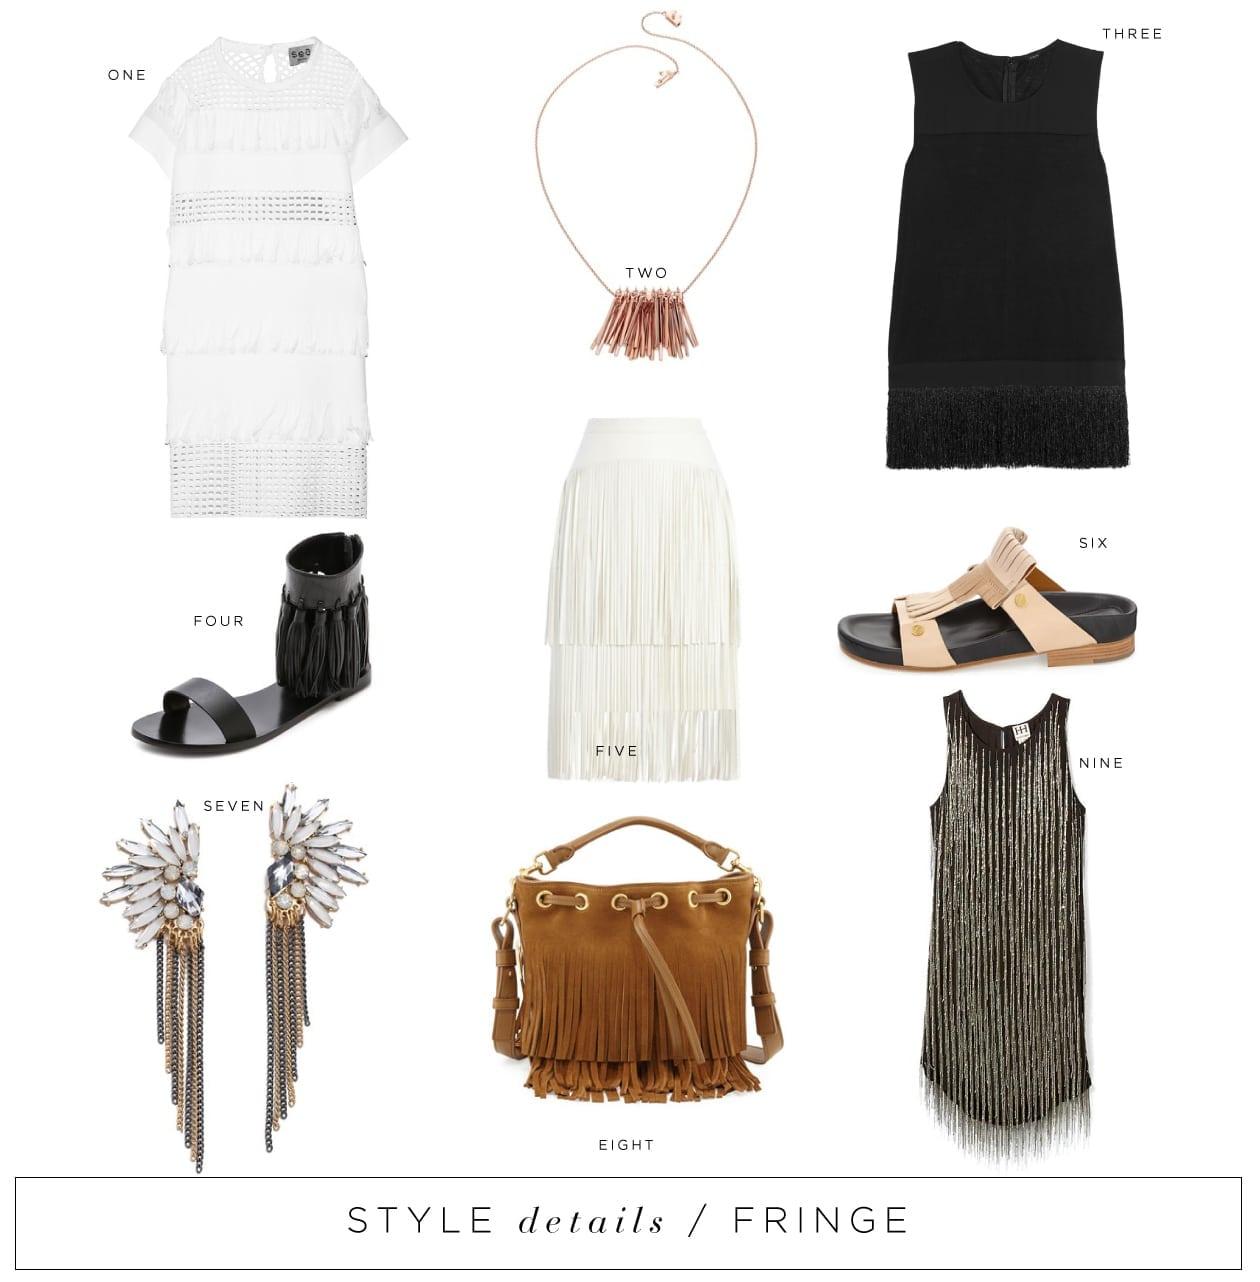 StyleDetails-Fringe